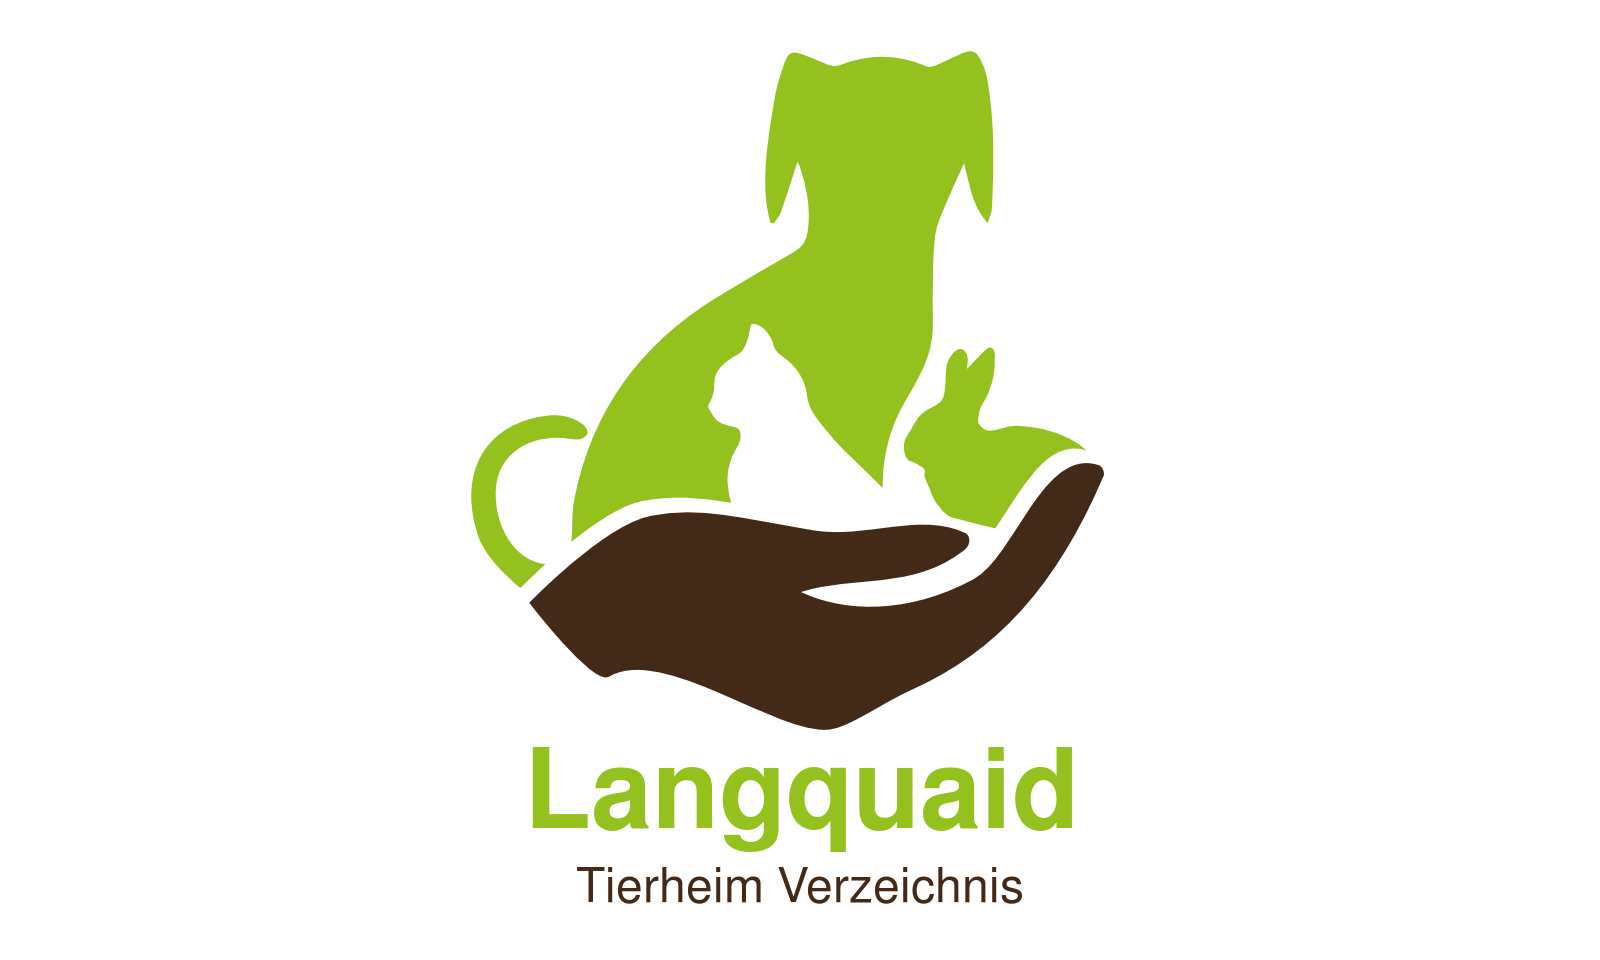 Tierheim Langquaid